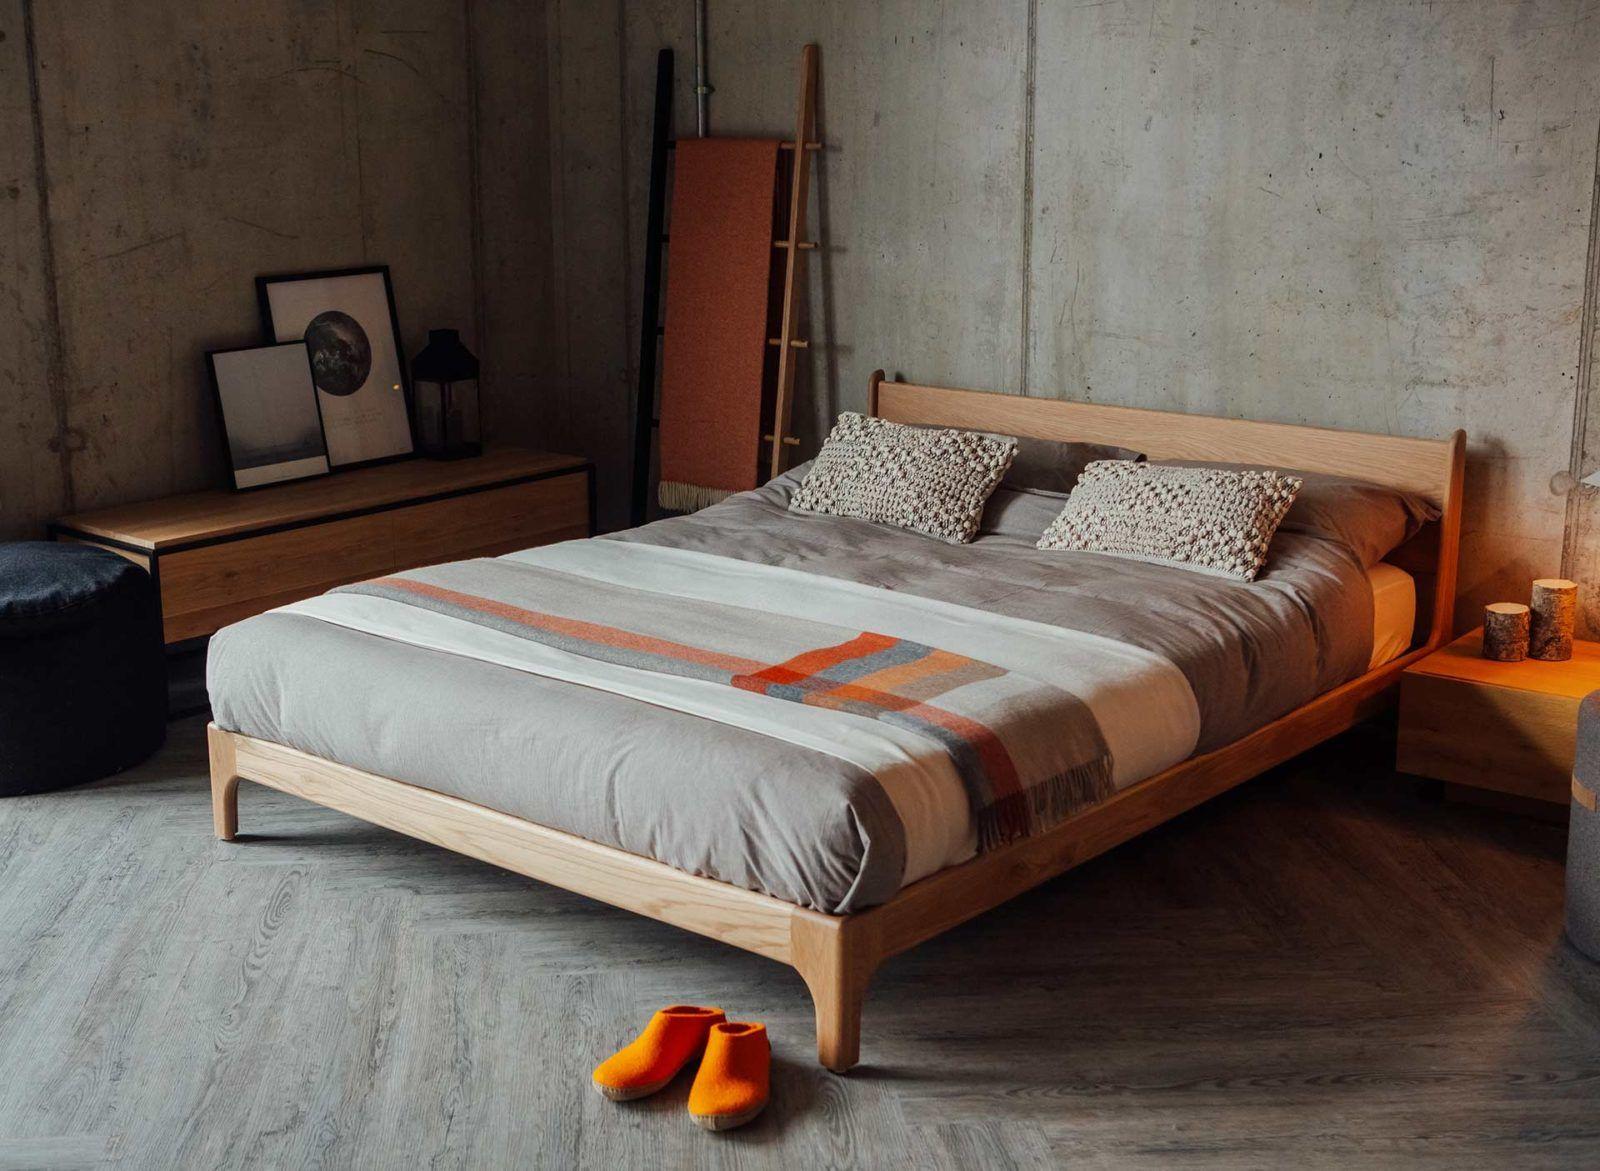 Pimlico Low Handmade Bed Bed Wood Beds Bedding Master Bedroom